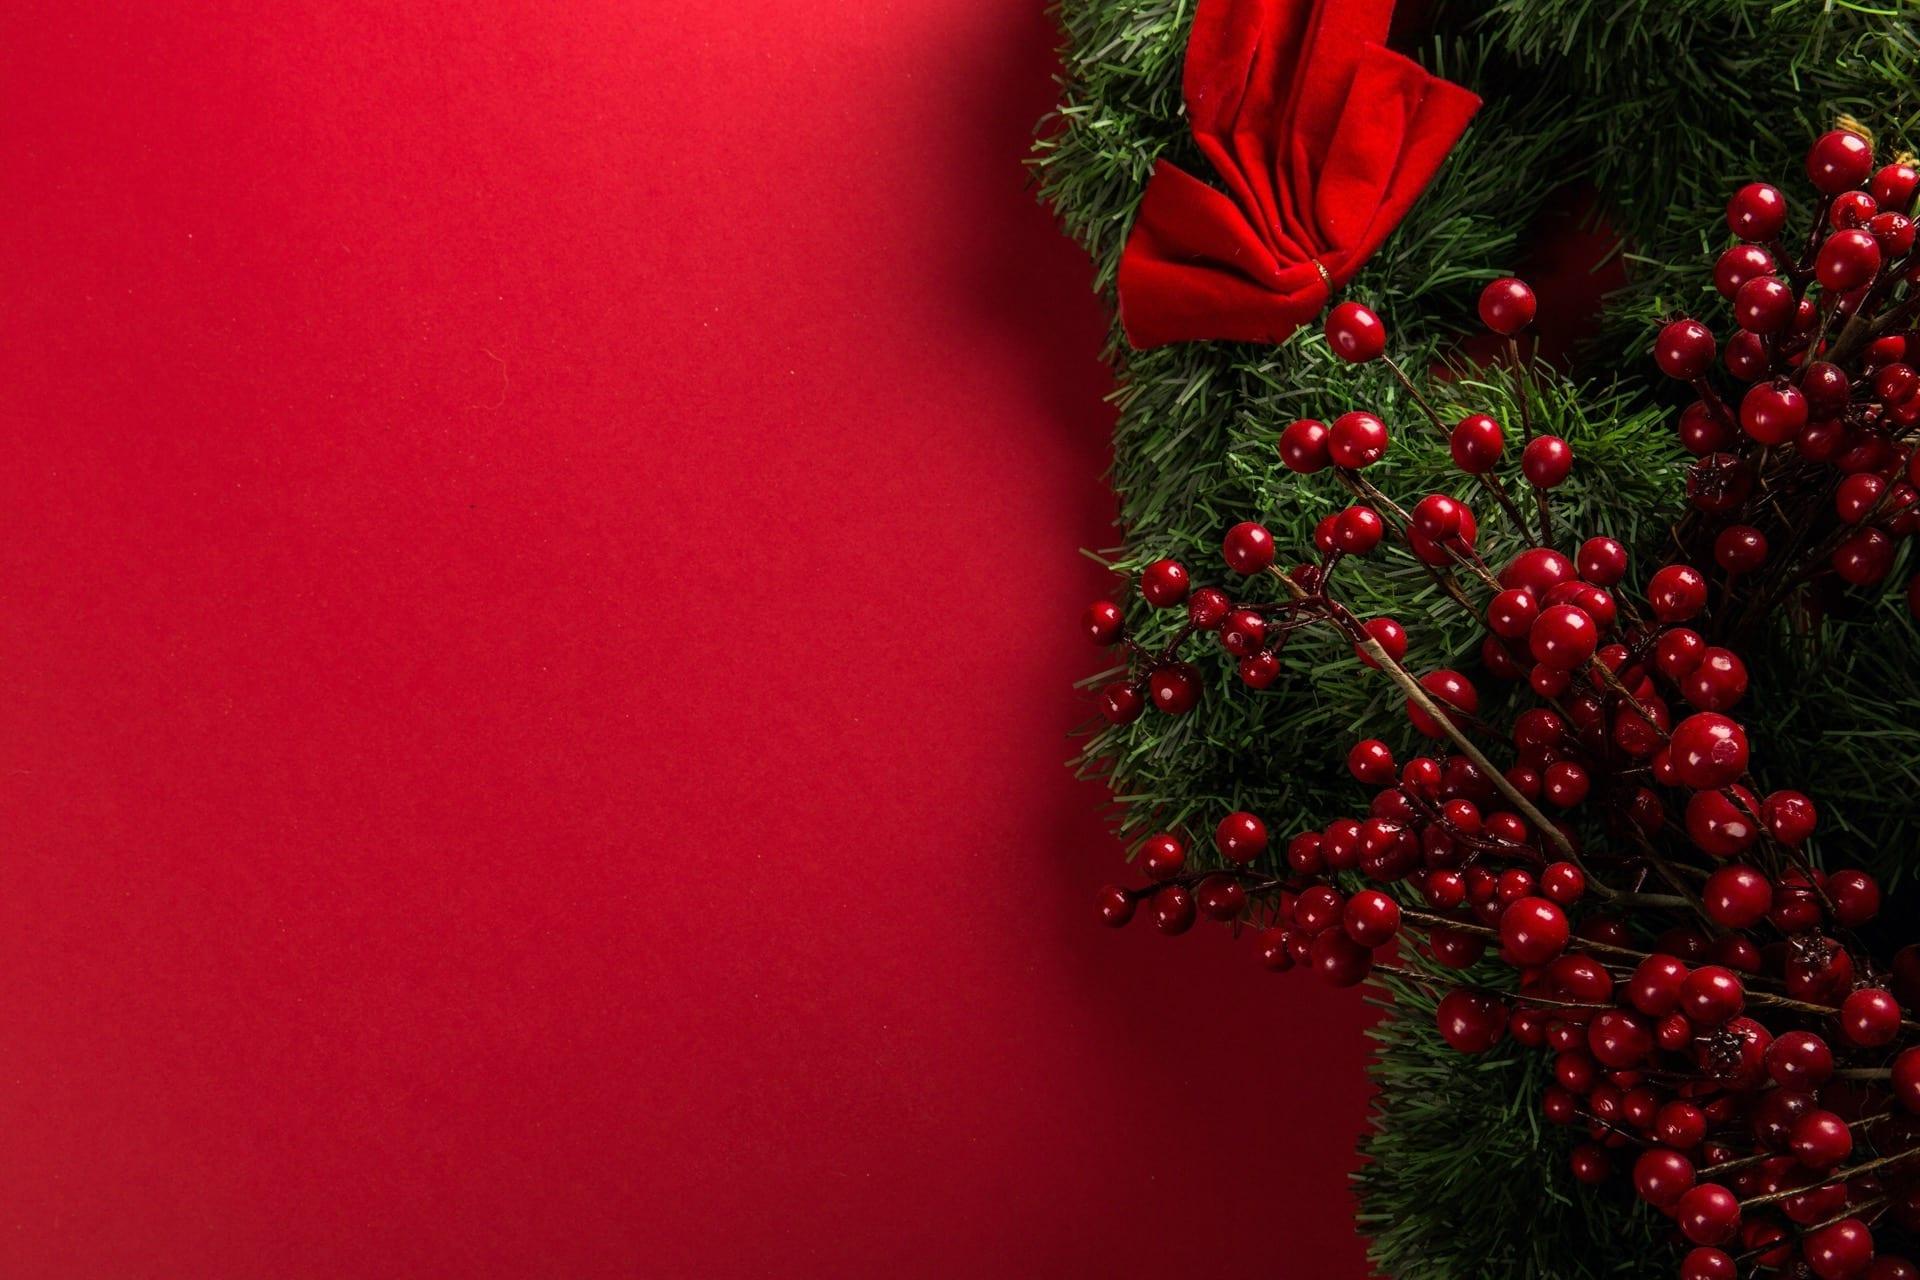 The 12 Days of Christmas and Christmastide